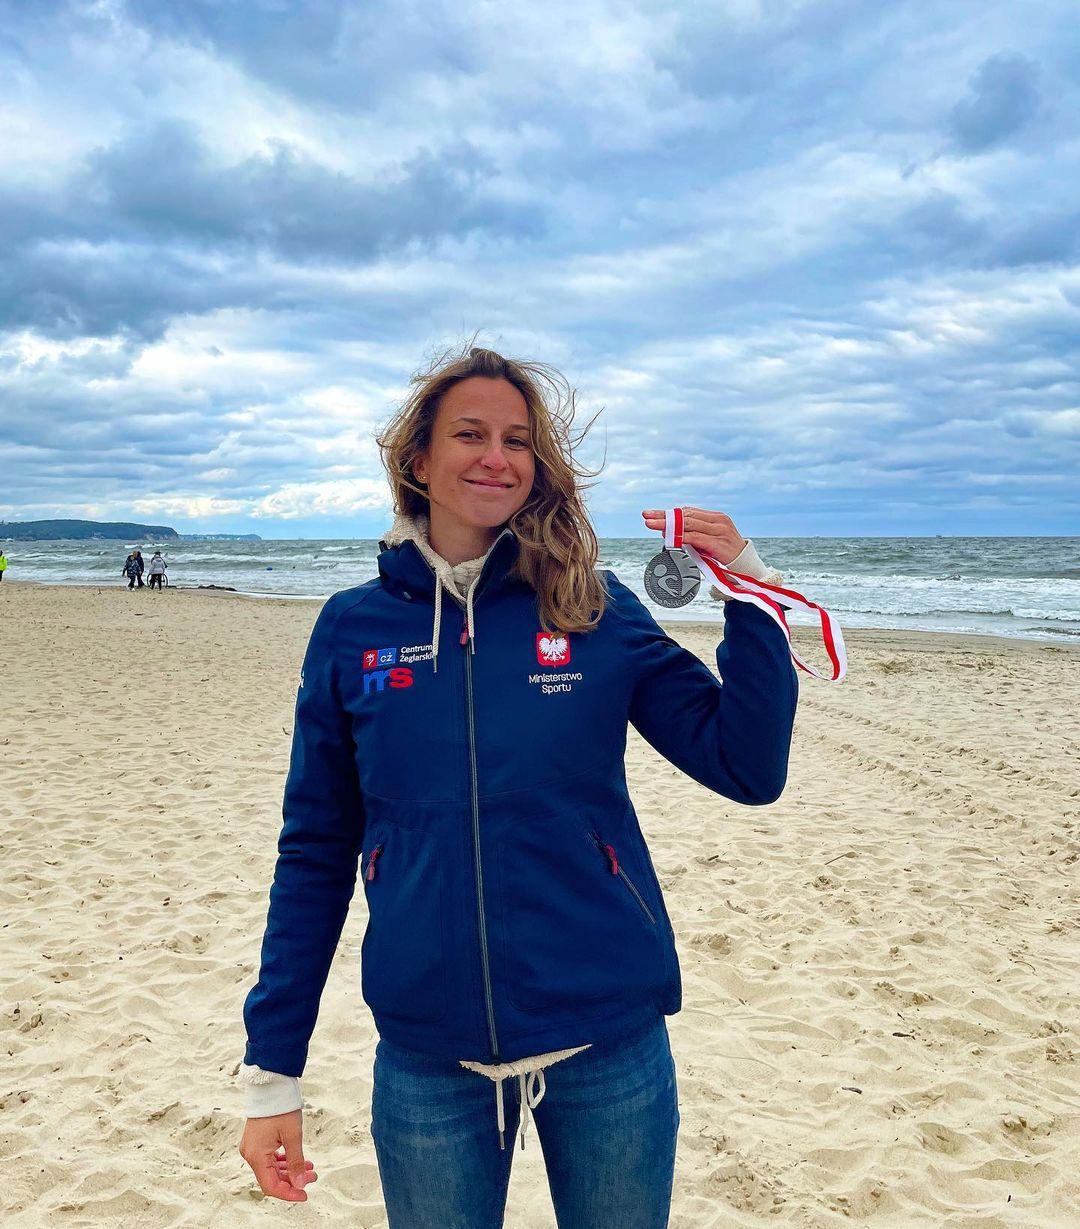 Silver medal IQFoil Polish Championship